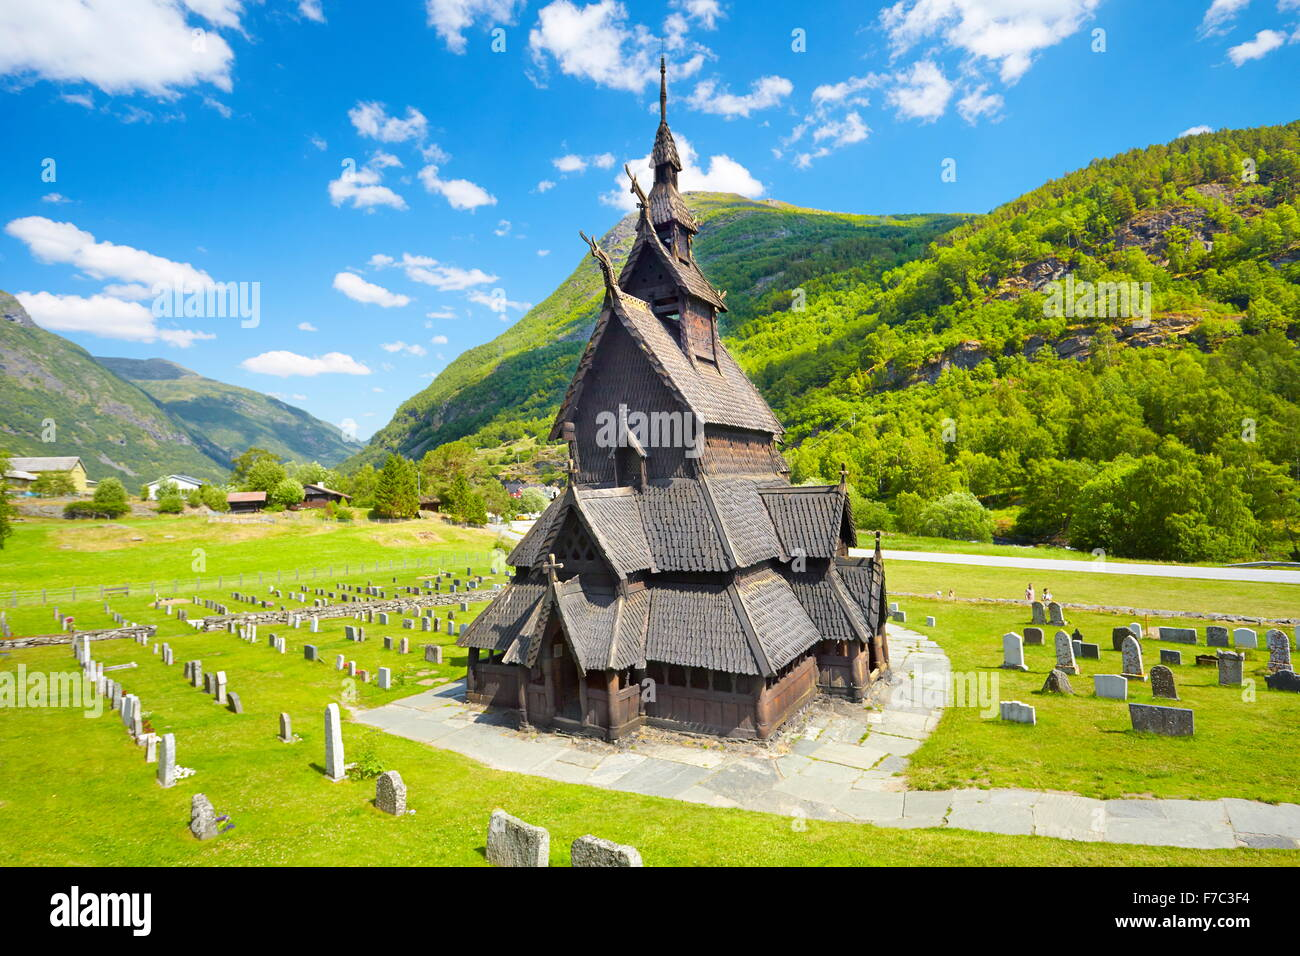 Borgund Stave Church, Sogn og Fjordane, Norway - Stock Image